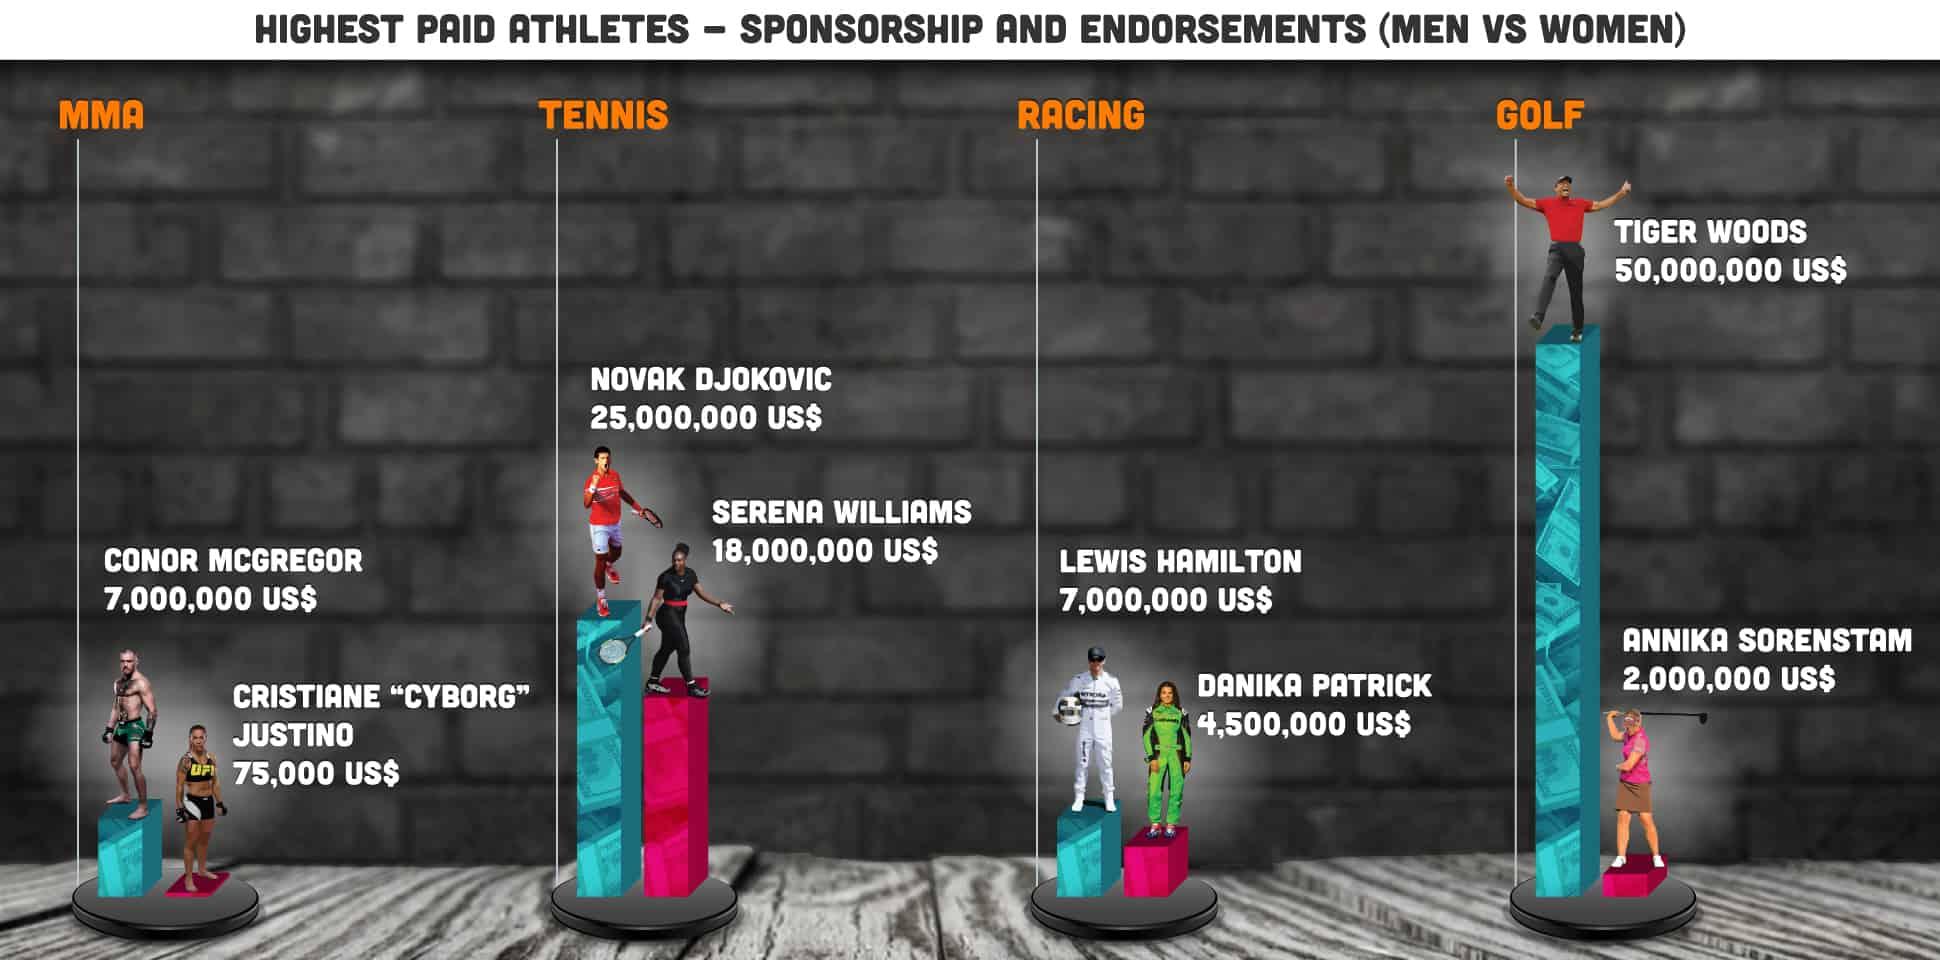 Sponsorship and Endorsements - Highest Paid Athletes - Men vs Women